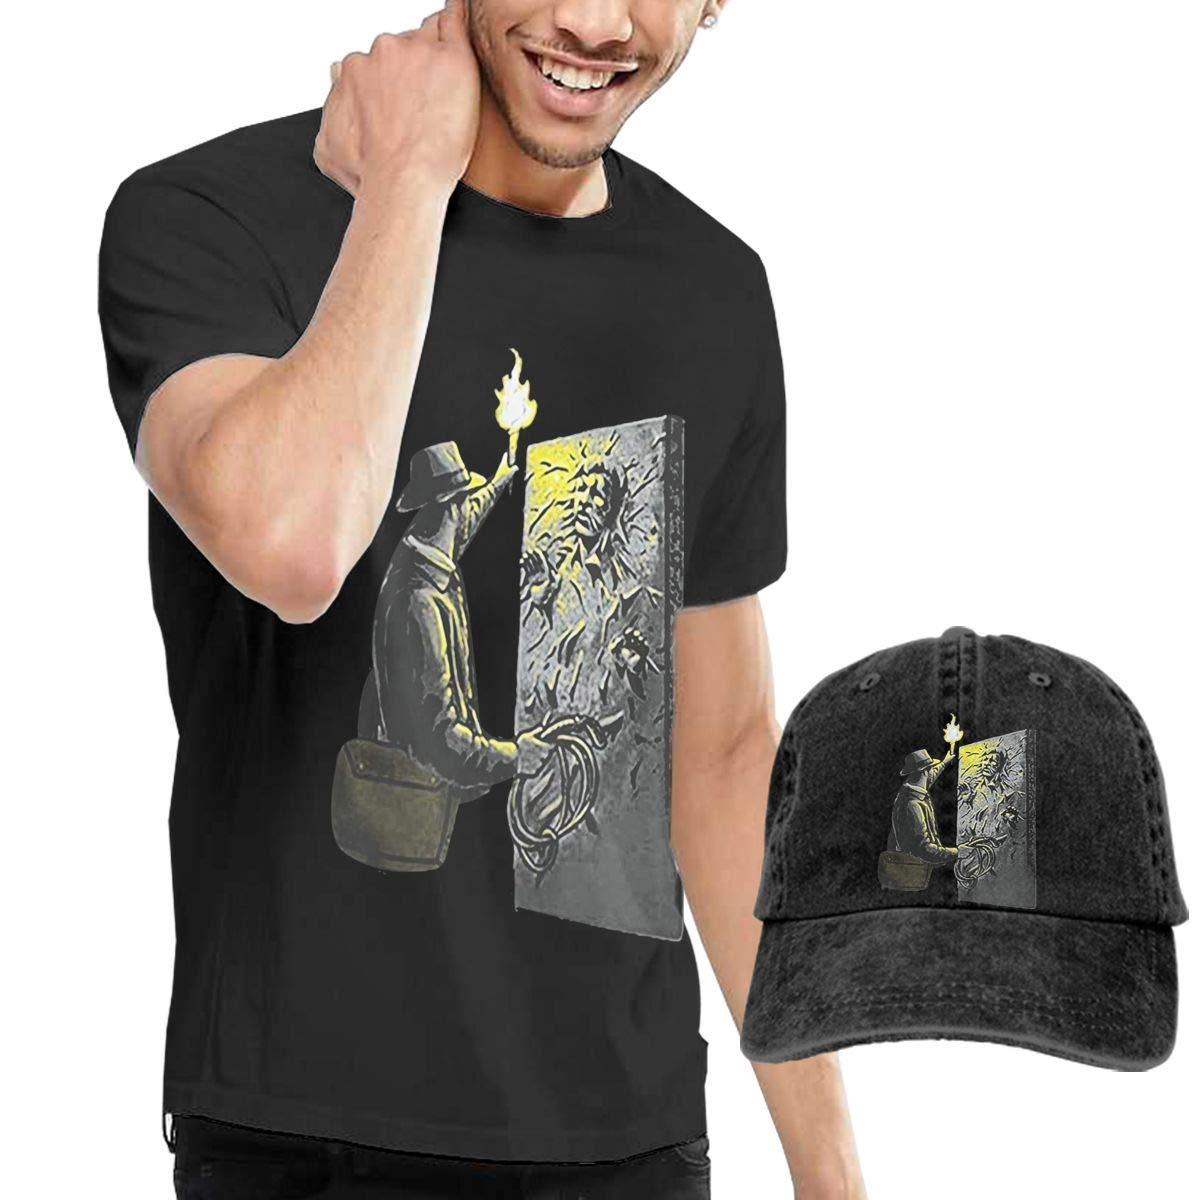 Hfusih.fhs6f789 Indiana Jones Han Adult Cap Adjustable Cowboys Hats Baseball Cap M Black